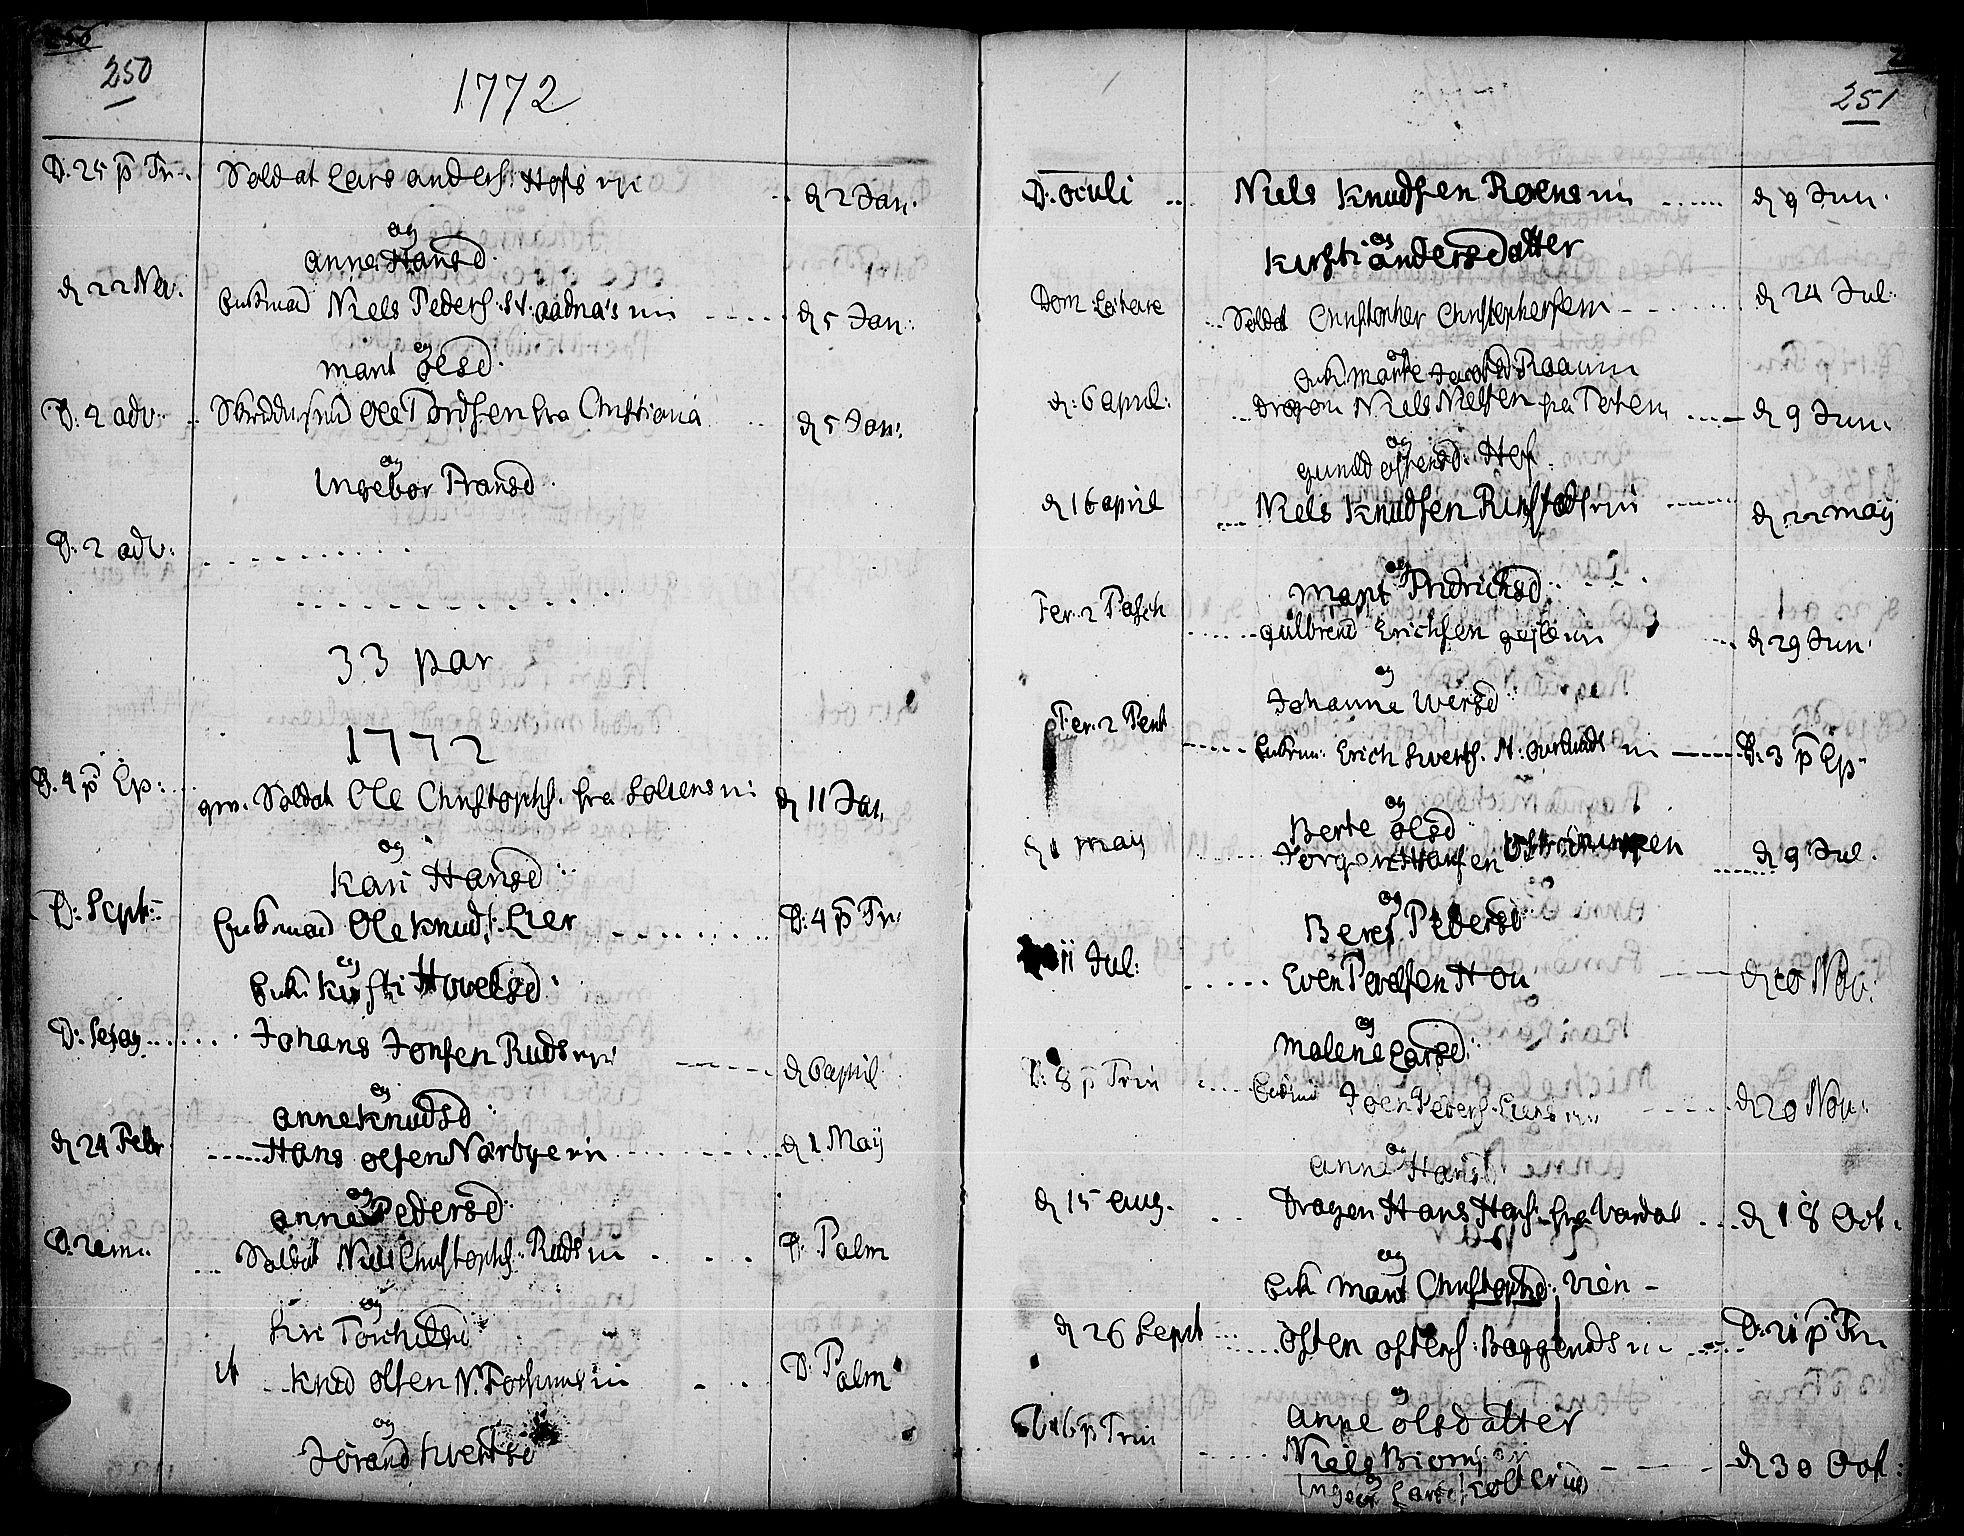 SAH, Land prestekontor, Ministerialbok nr. 5, 1765-1784, s. 250-251